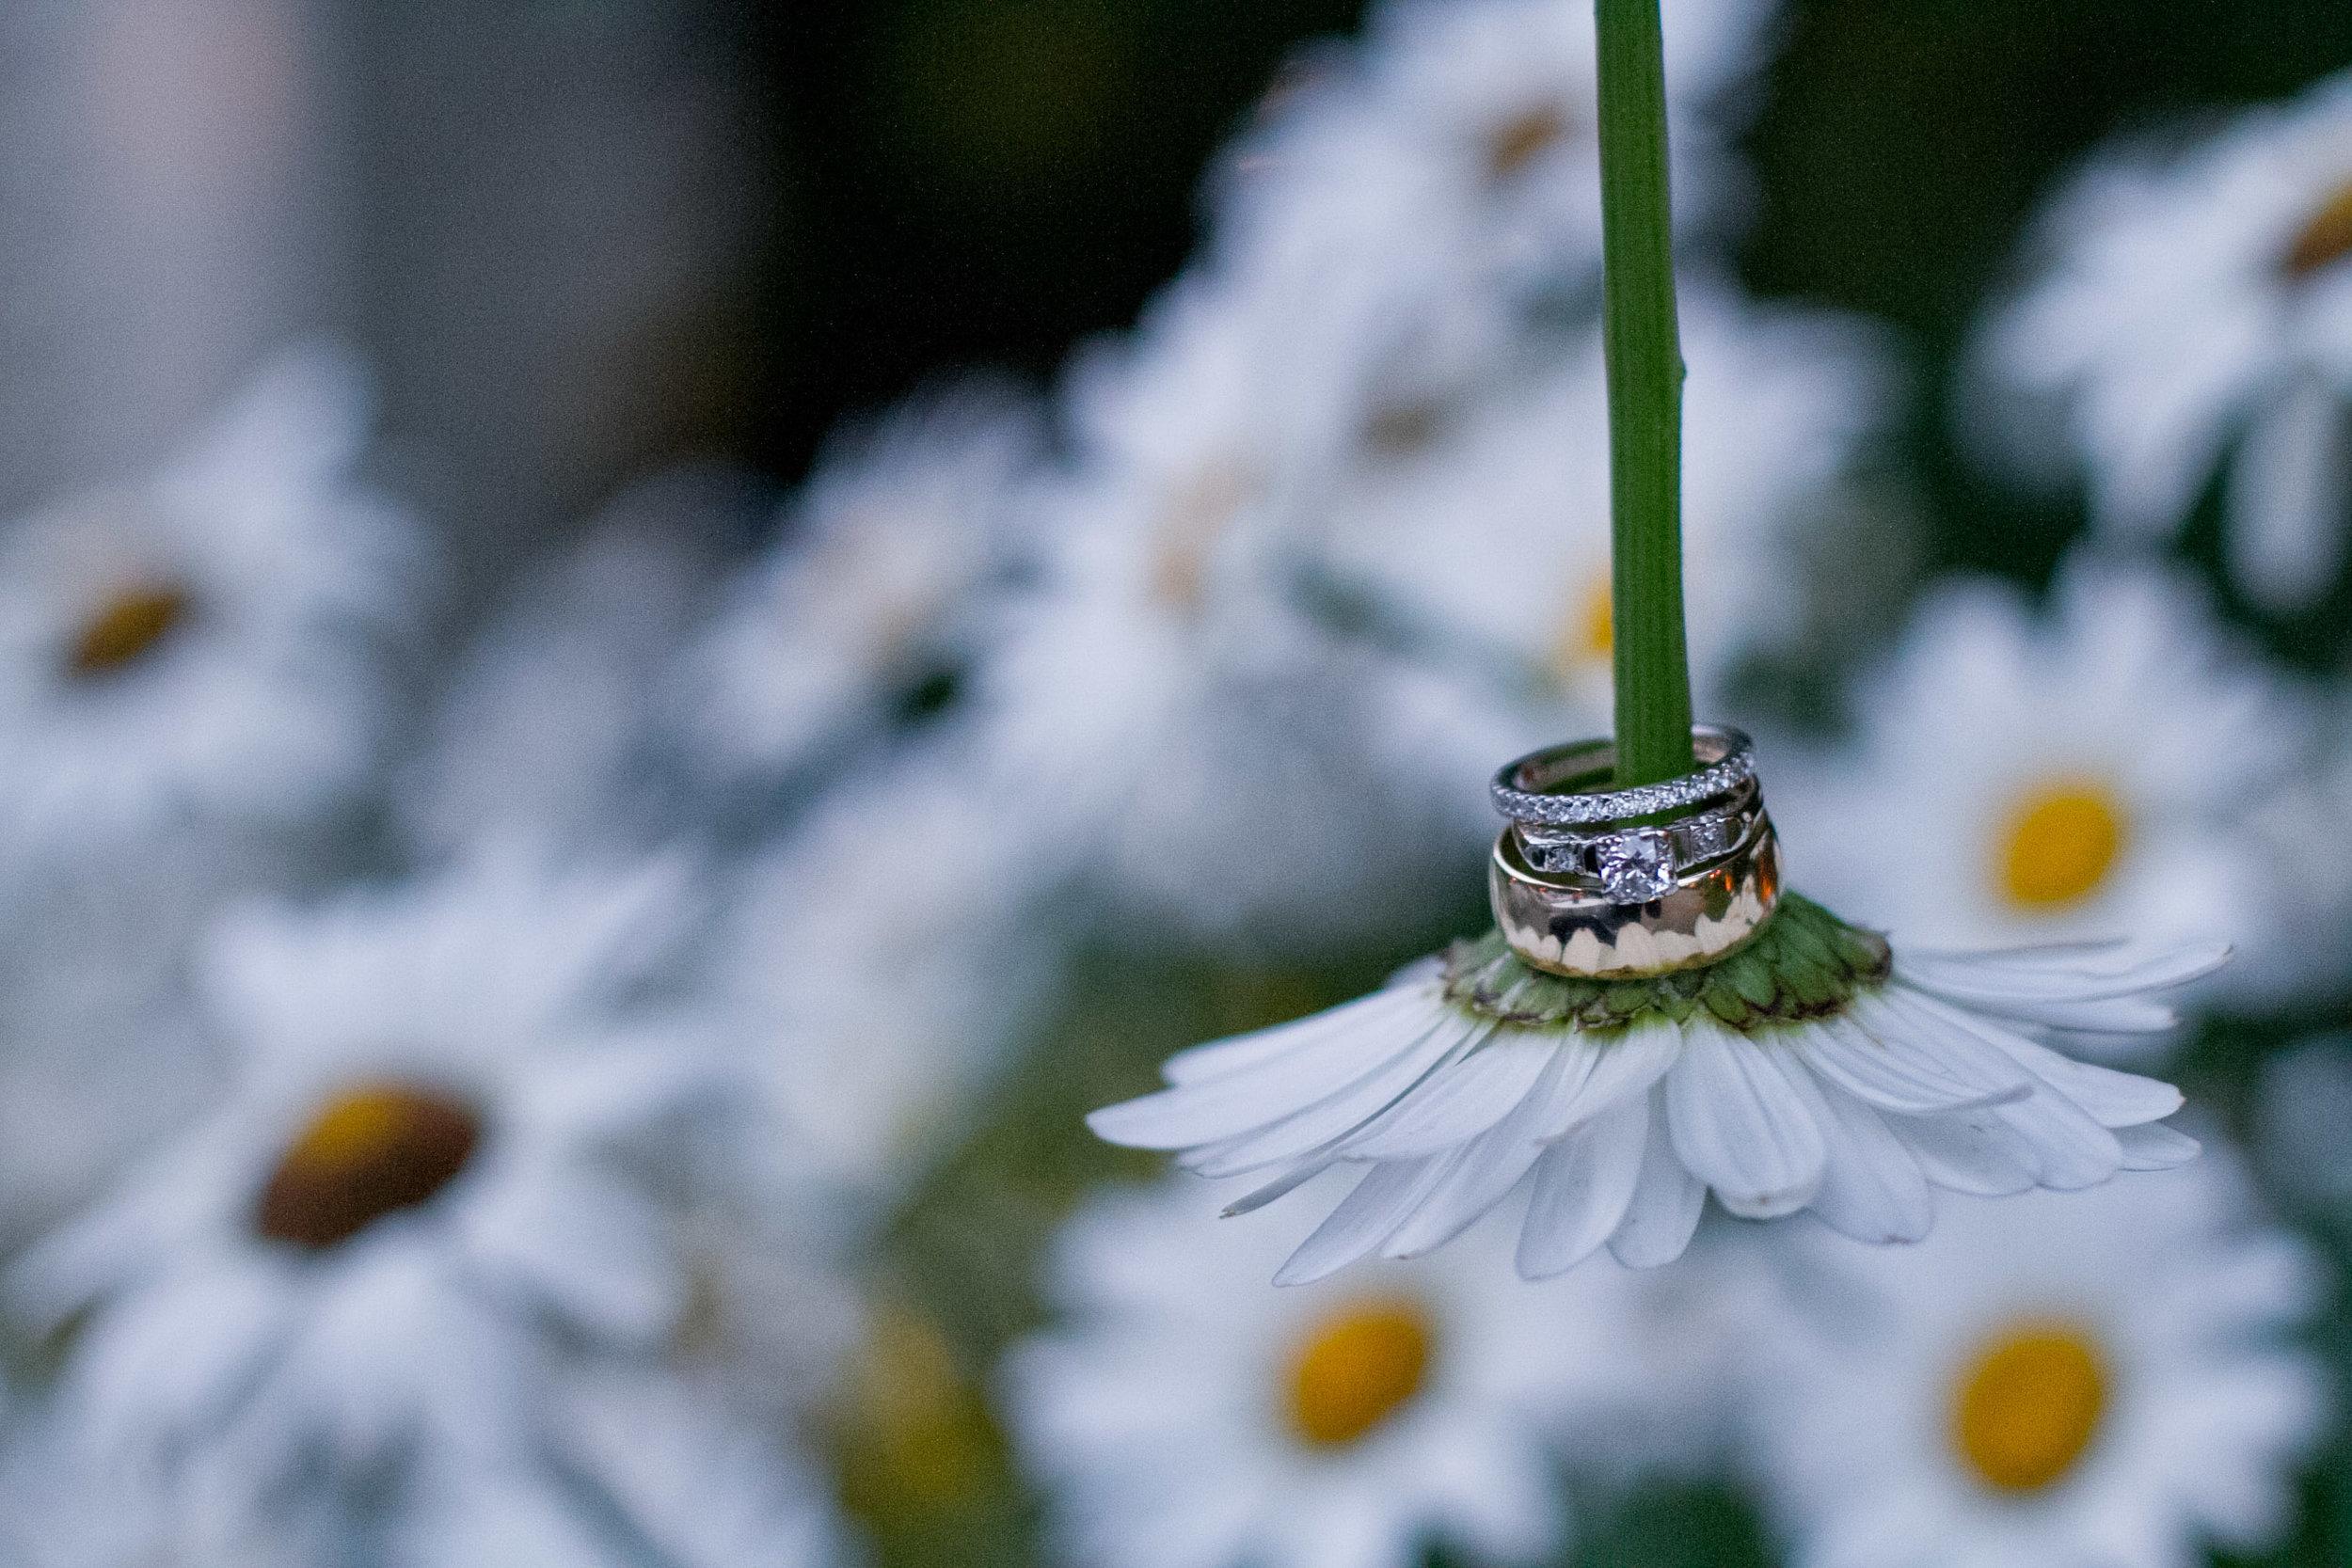 wedding ring detail shot on flowers stem